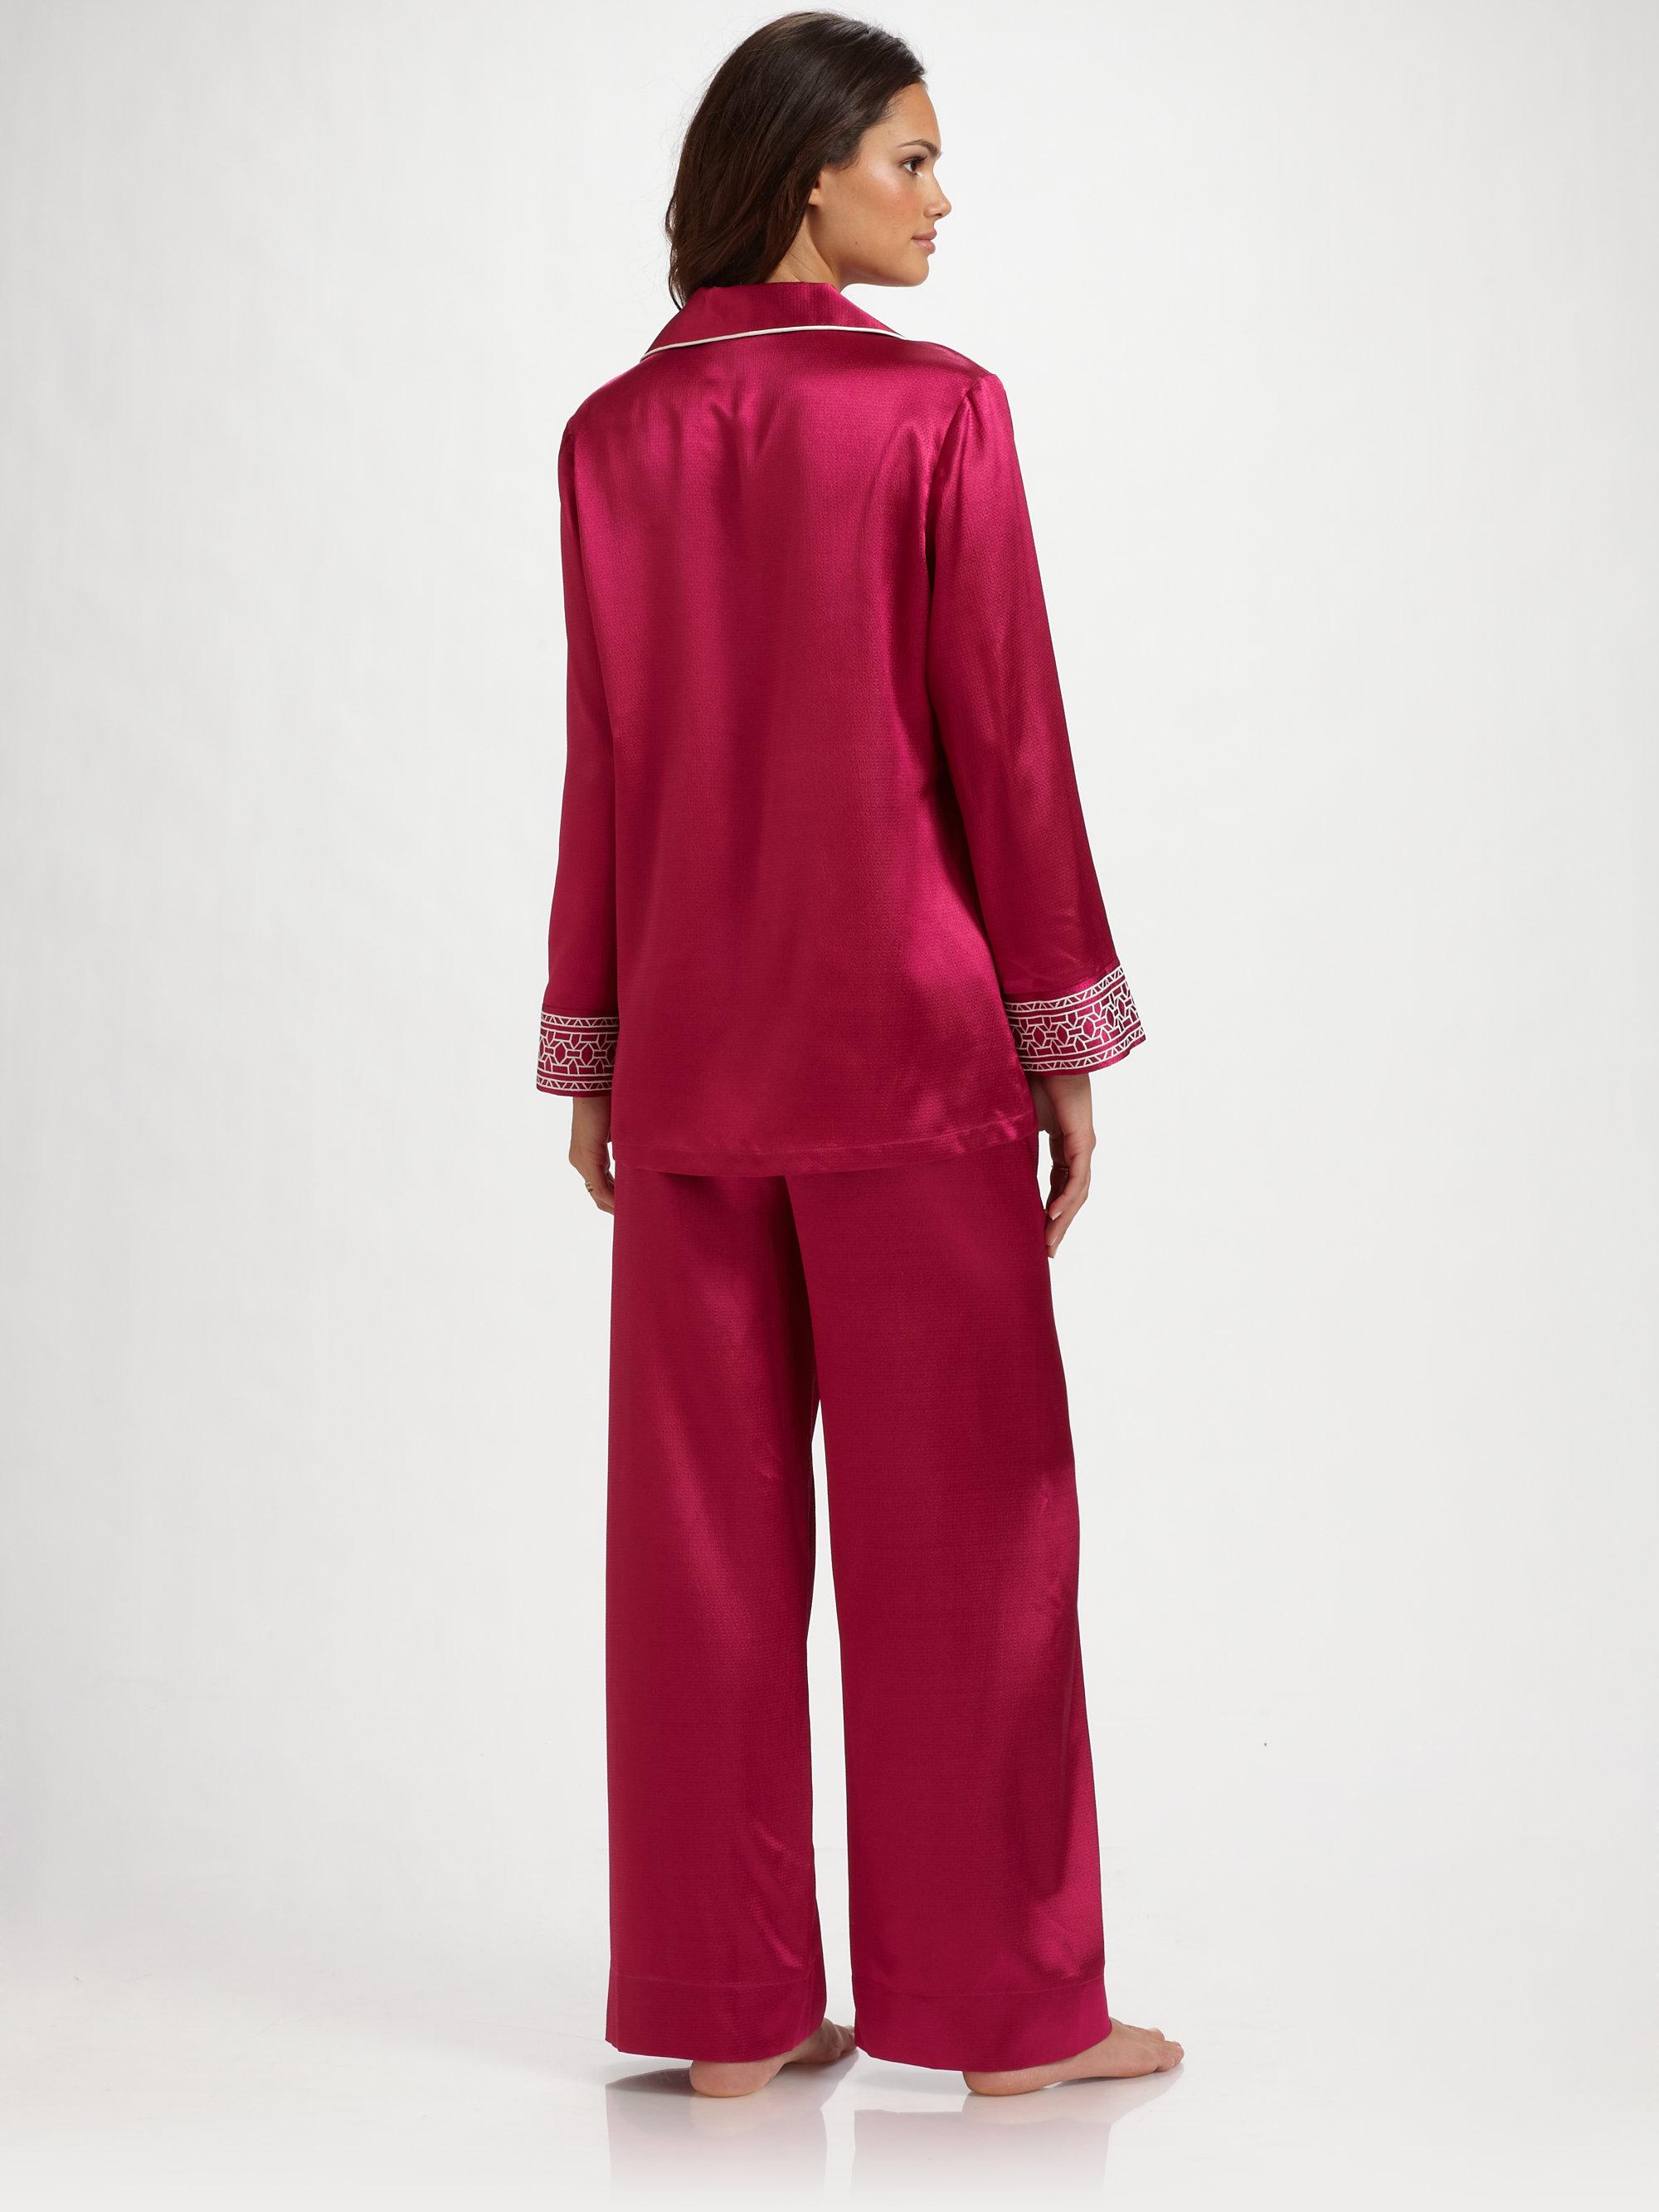 Lyst - Oscar de la Renta Jeweled Mosaic Pajamas in Pink d13e2a69b